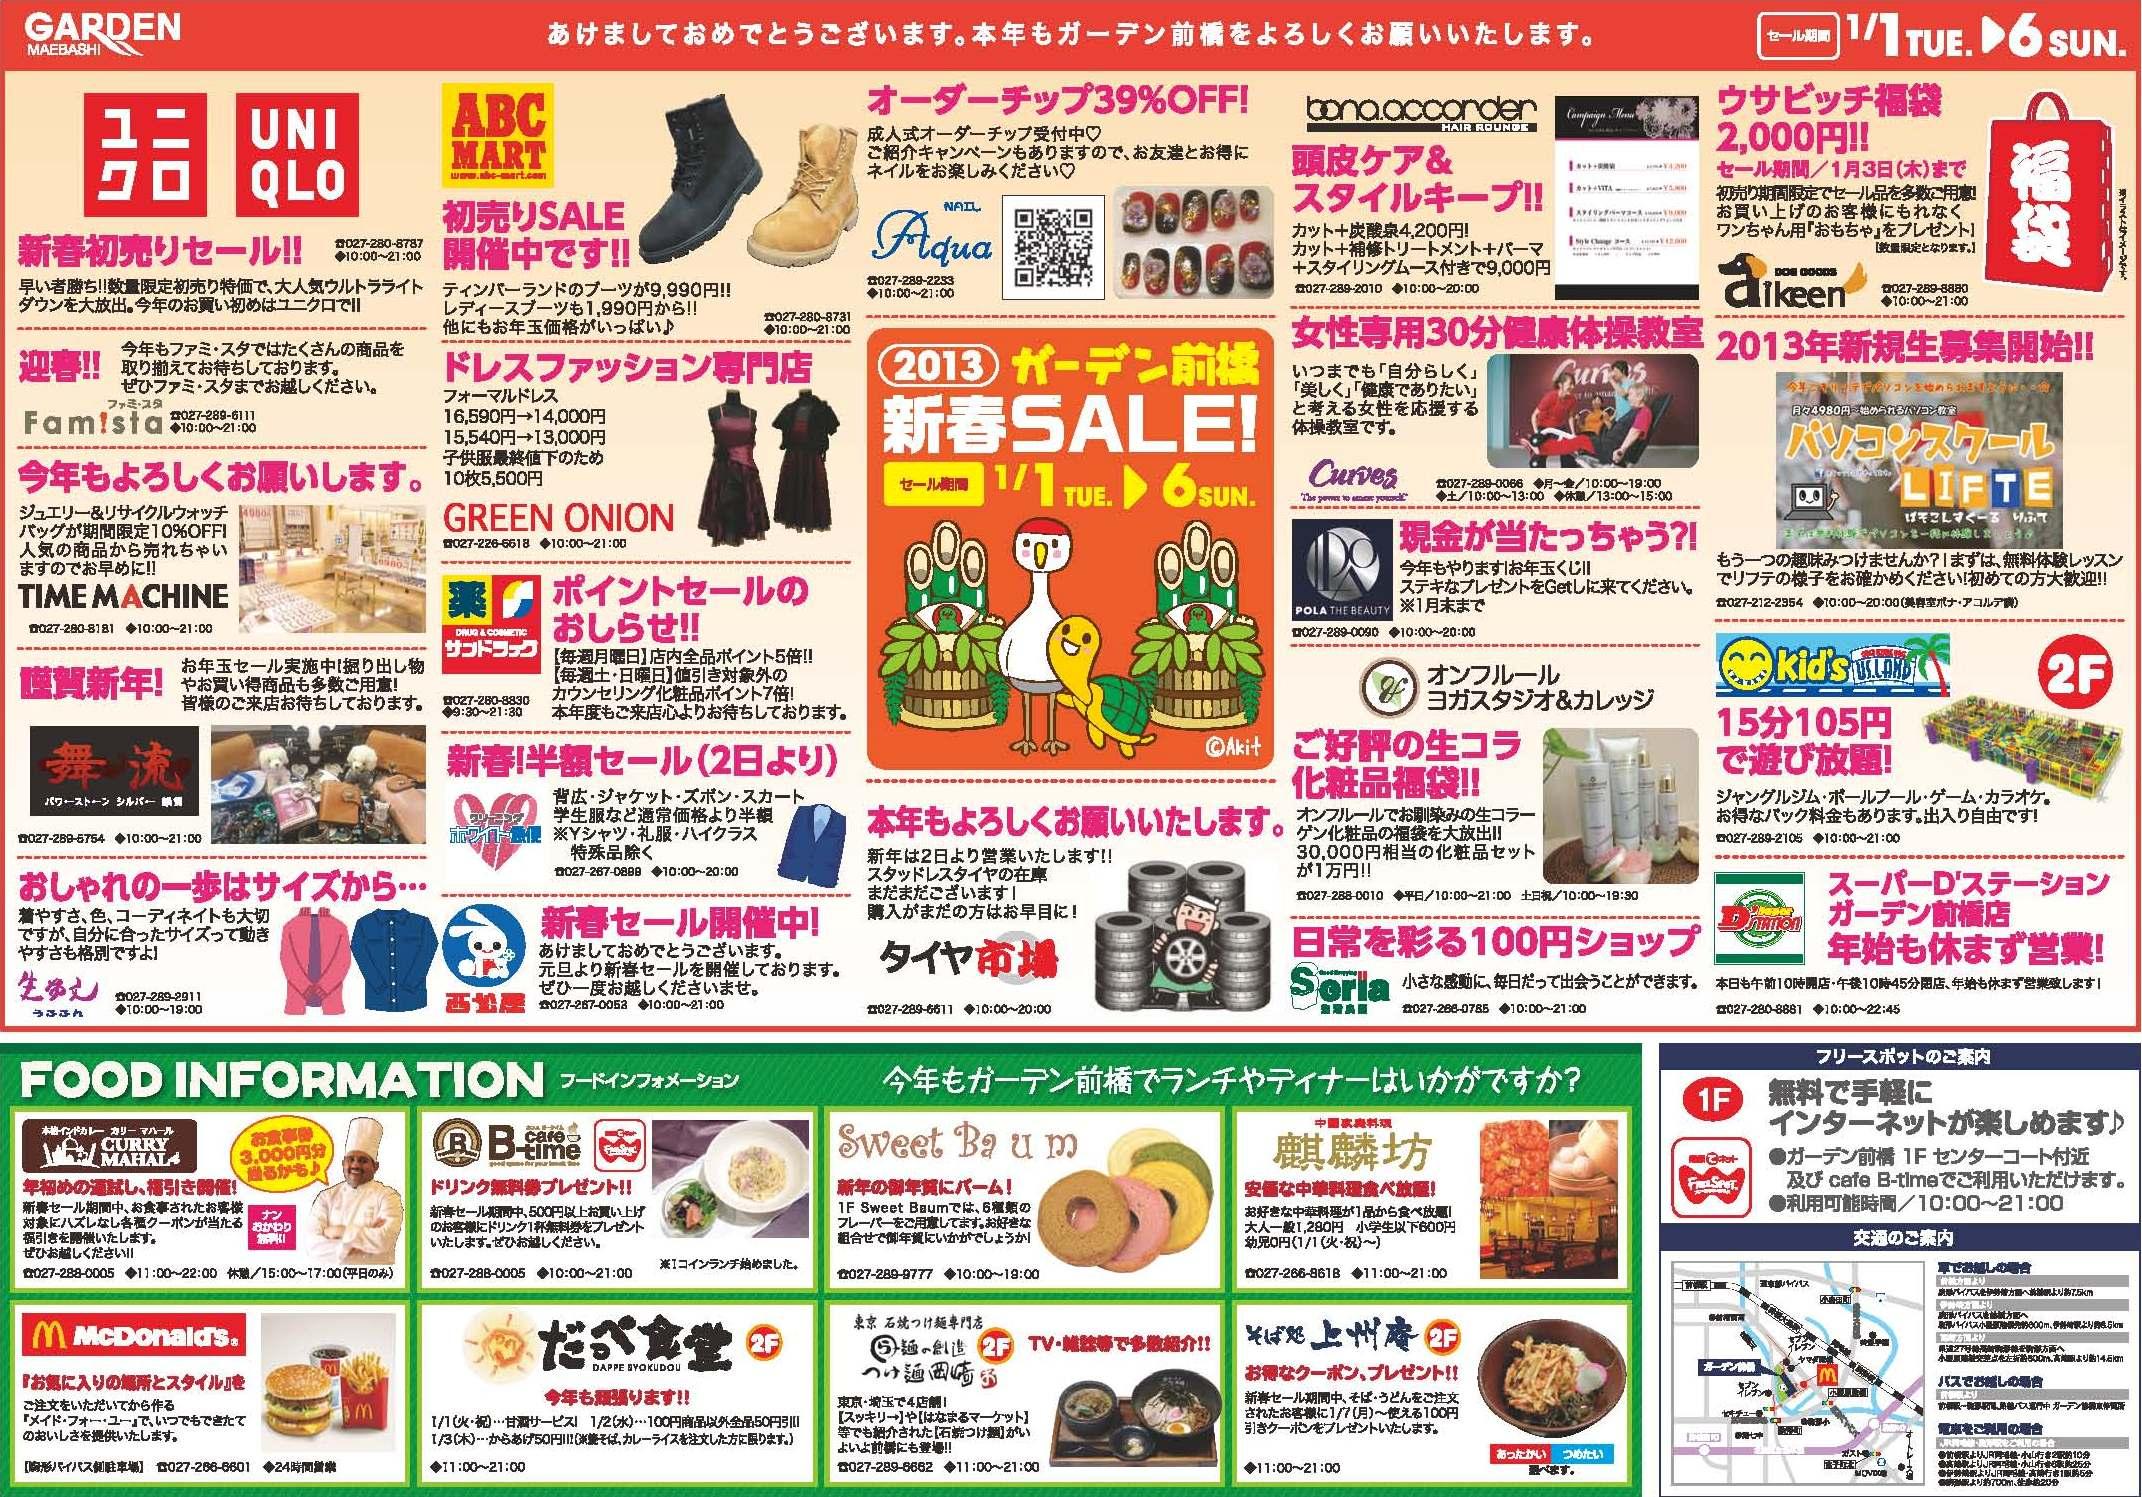 maebashi chat Slut sex in maebashi on kopmaunhasorg corneli - massage, role play & fantasy in maebashi.